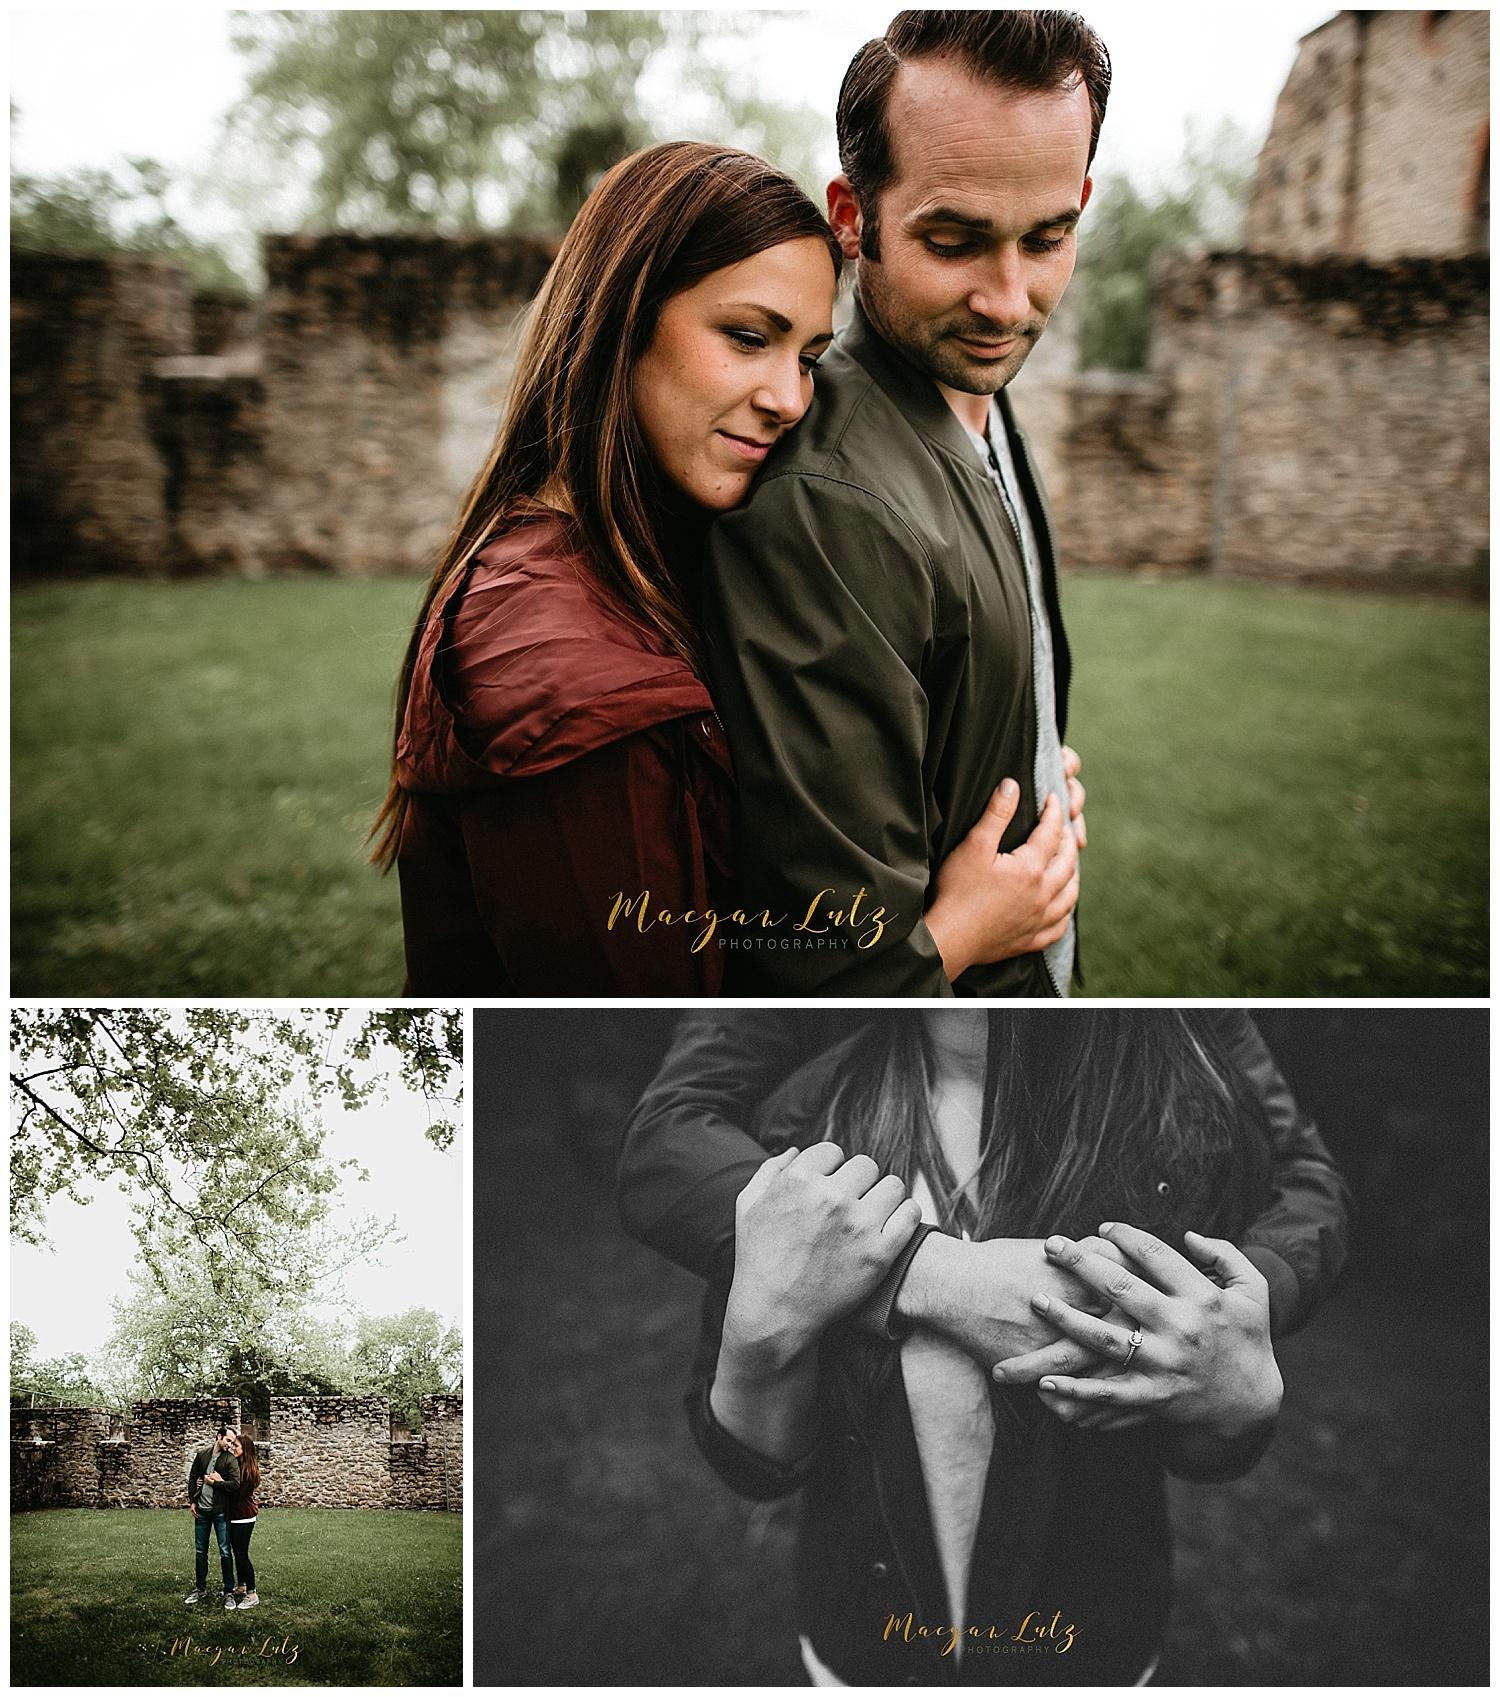 NEPA-wedding-engagement-photographer-Lockridge-park-Alburtis-PA_0030.jpg